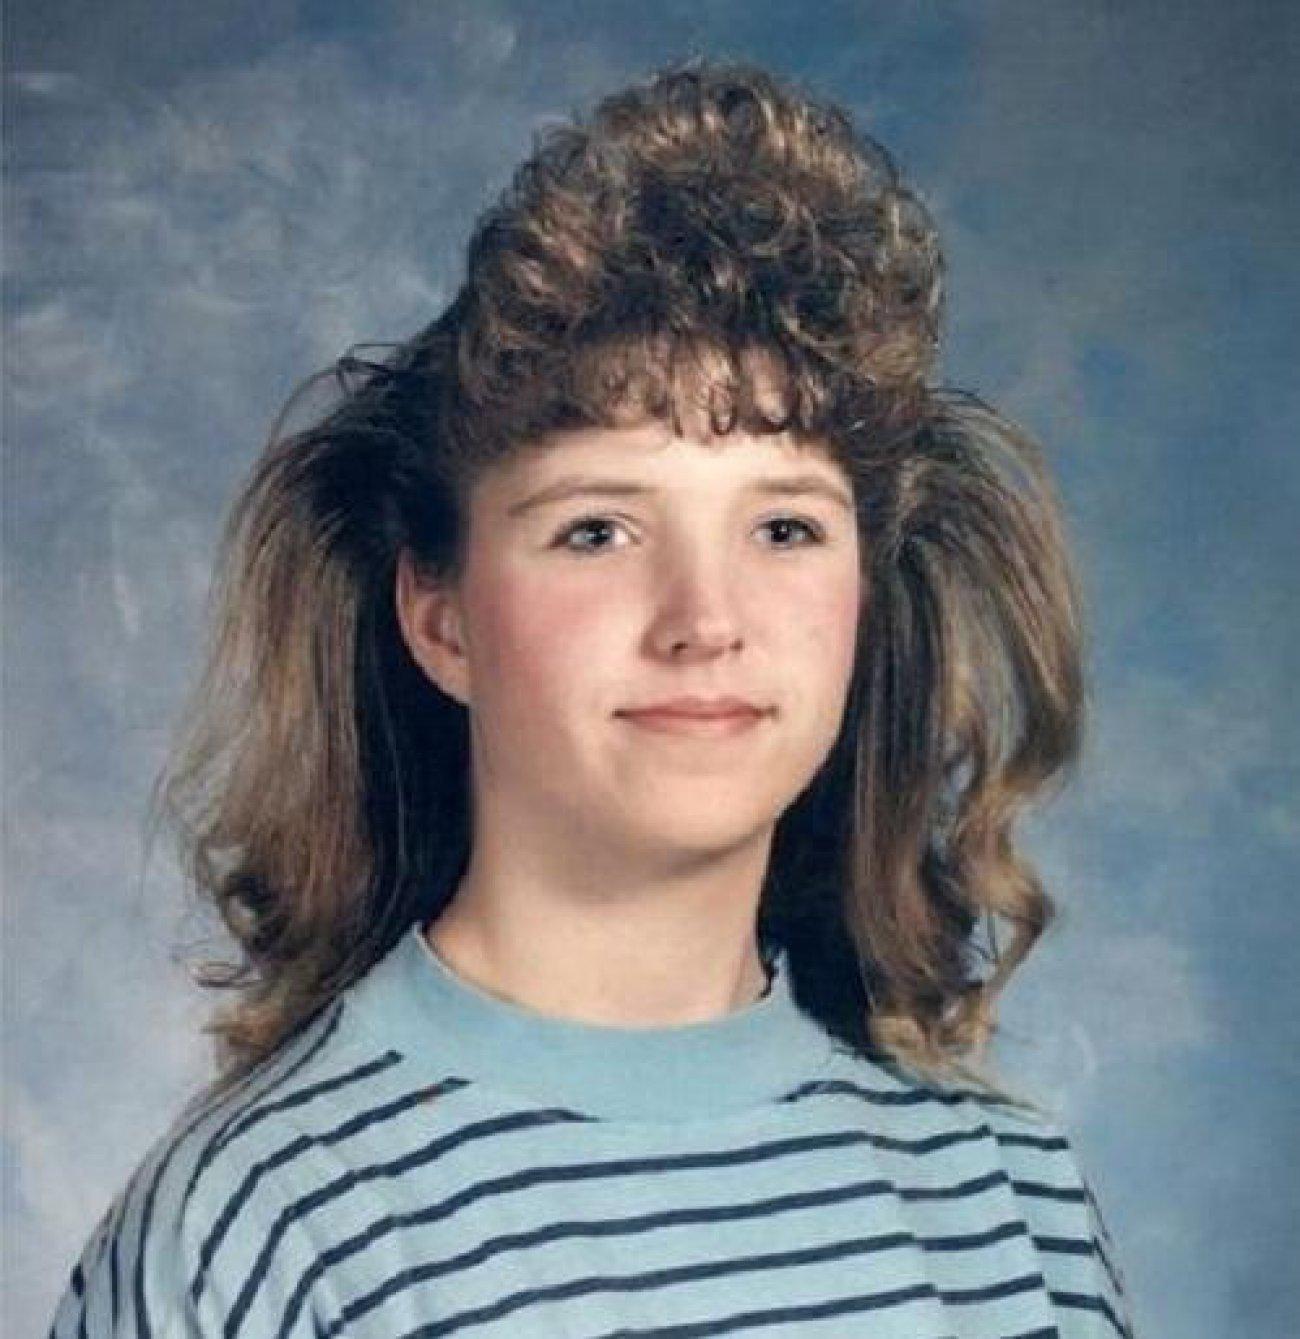 Cortes de pelo horribles de mujer